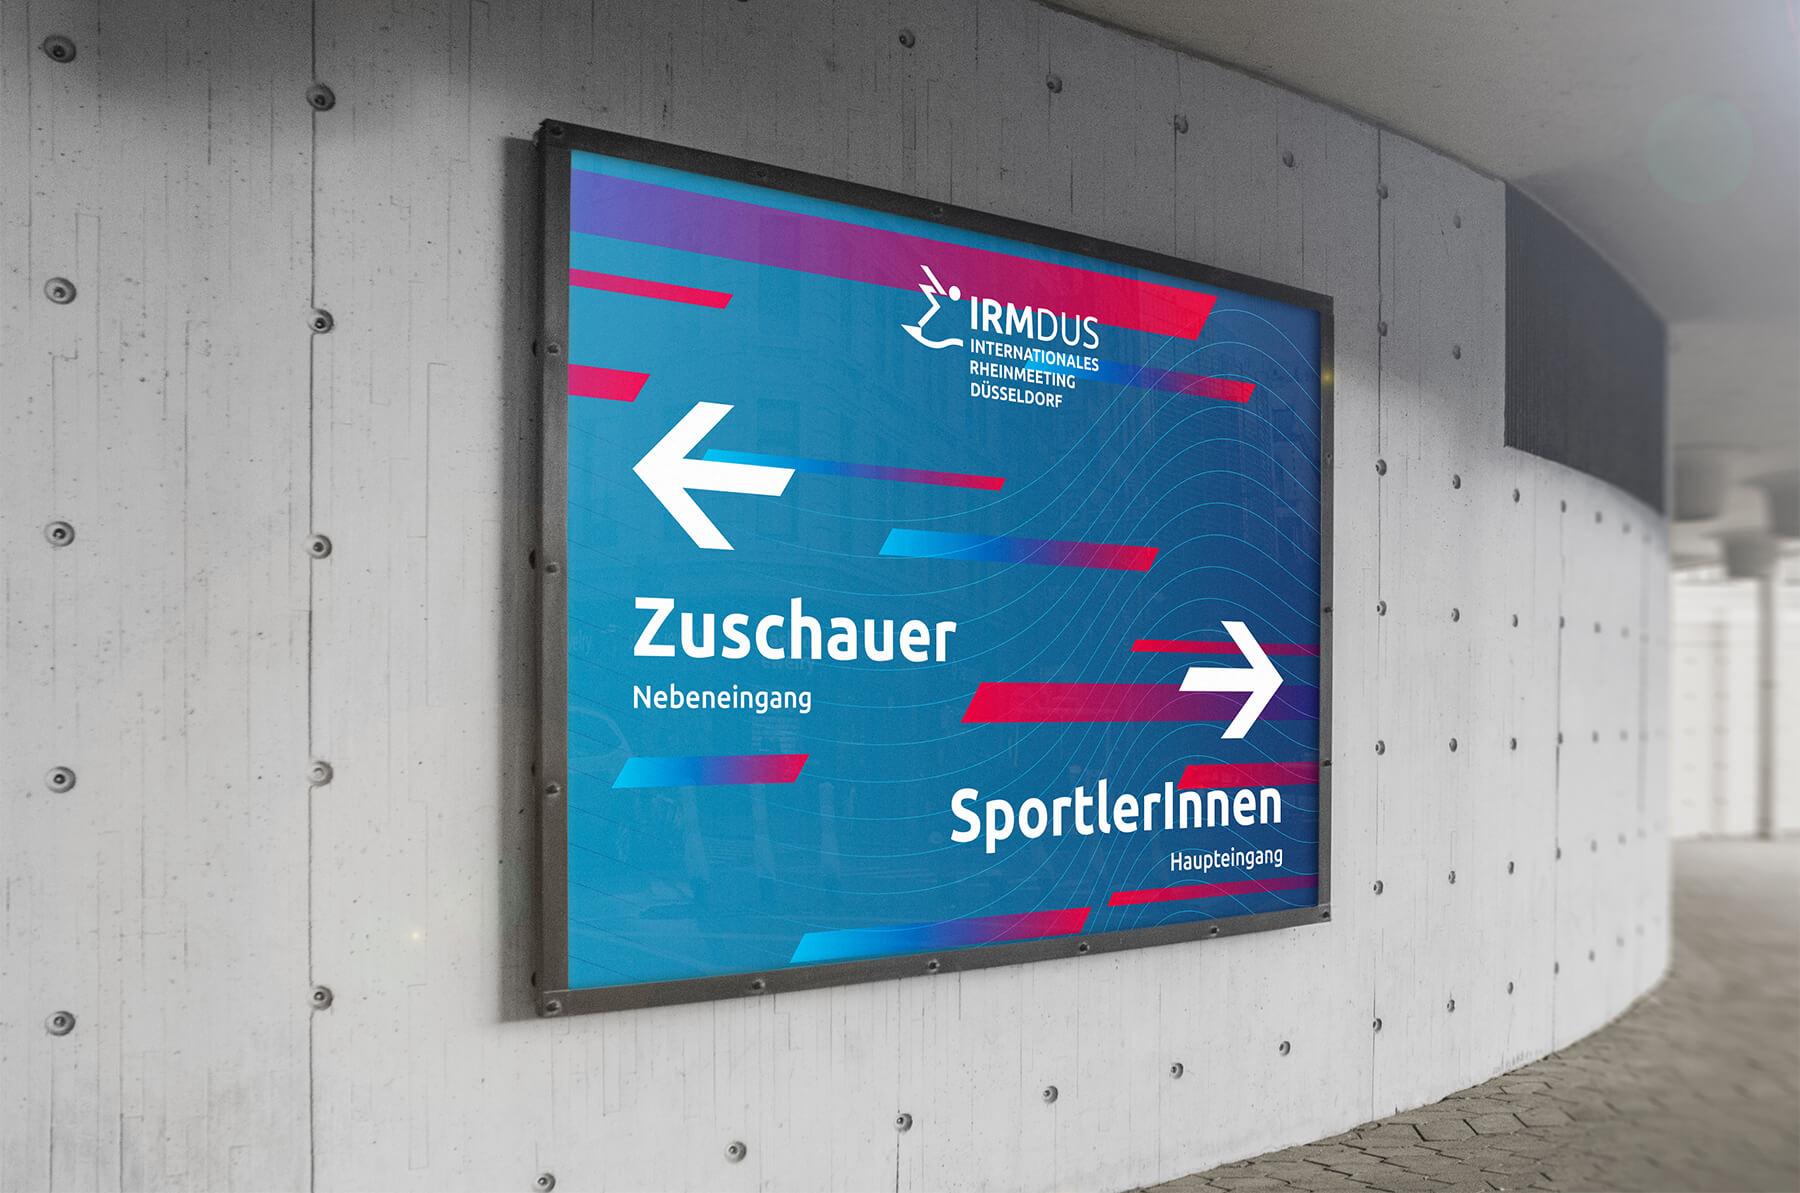 IRM DUS Logo Internationales Rheinmeeting Düsseldorf Eventmarketing Sport Aussenwerbung Plakat